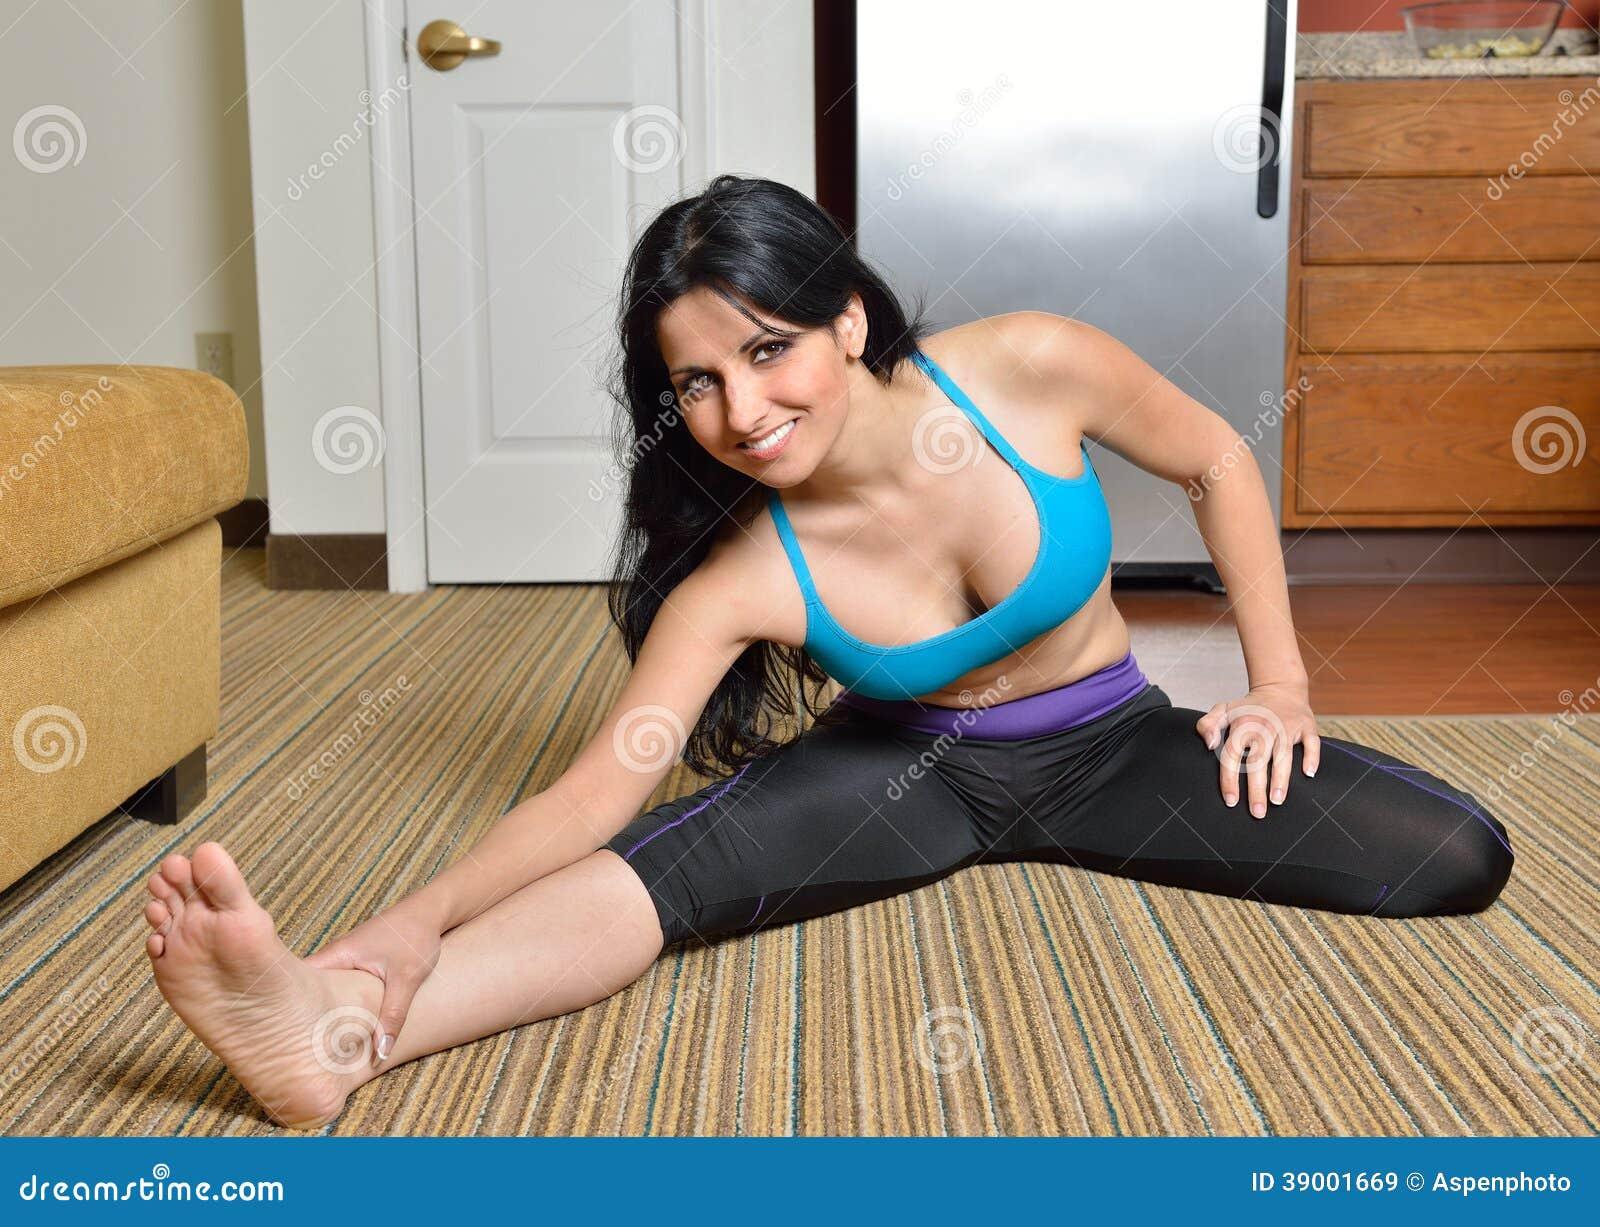 Athletic girl stretching legs on dildo 8